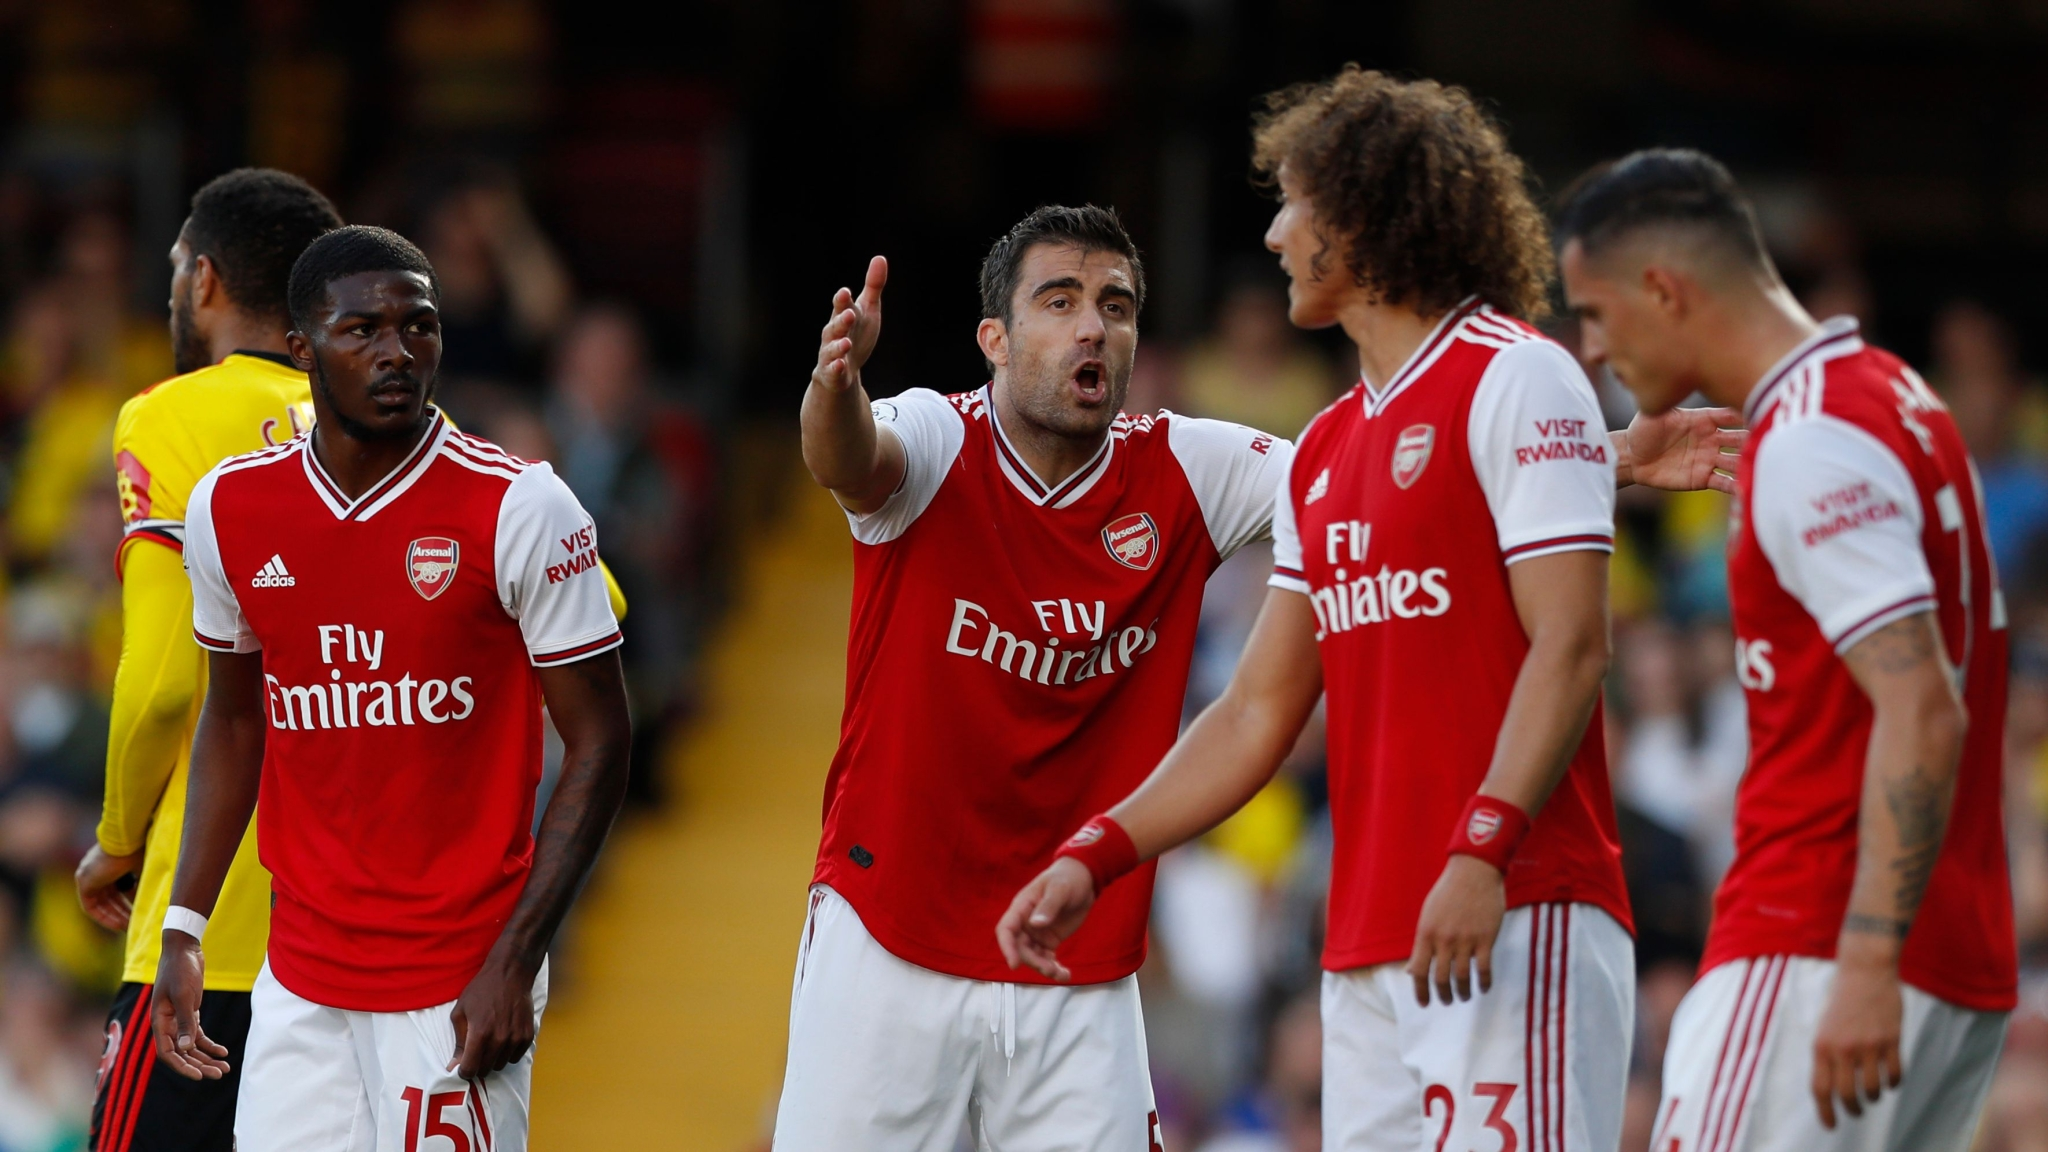 Aubameyang Scores Twice But Watford Fight Back to Draw Arsenal